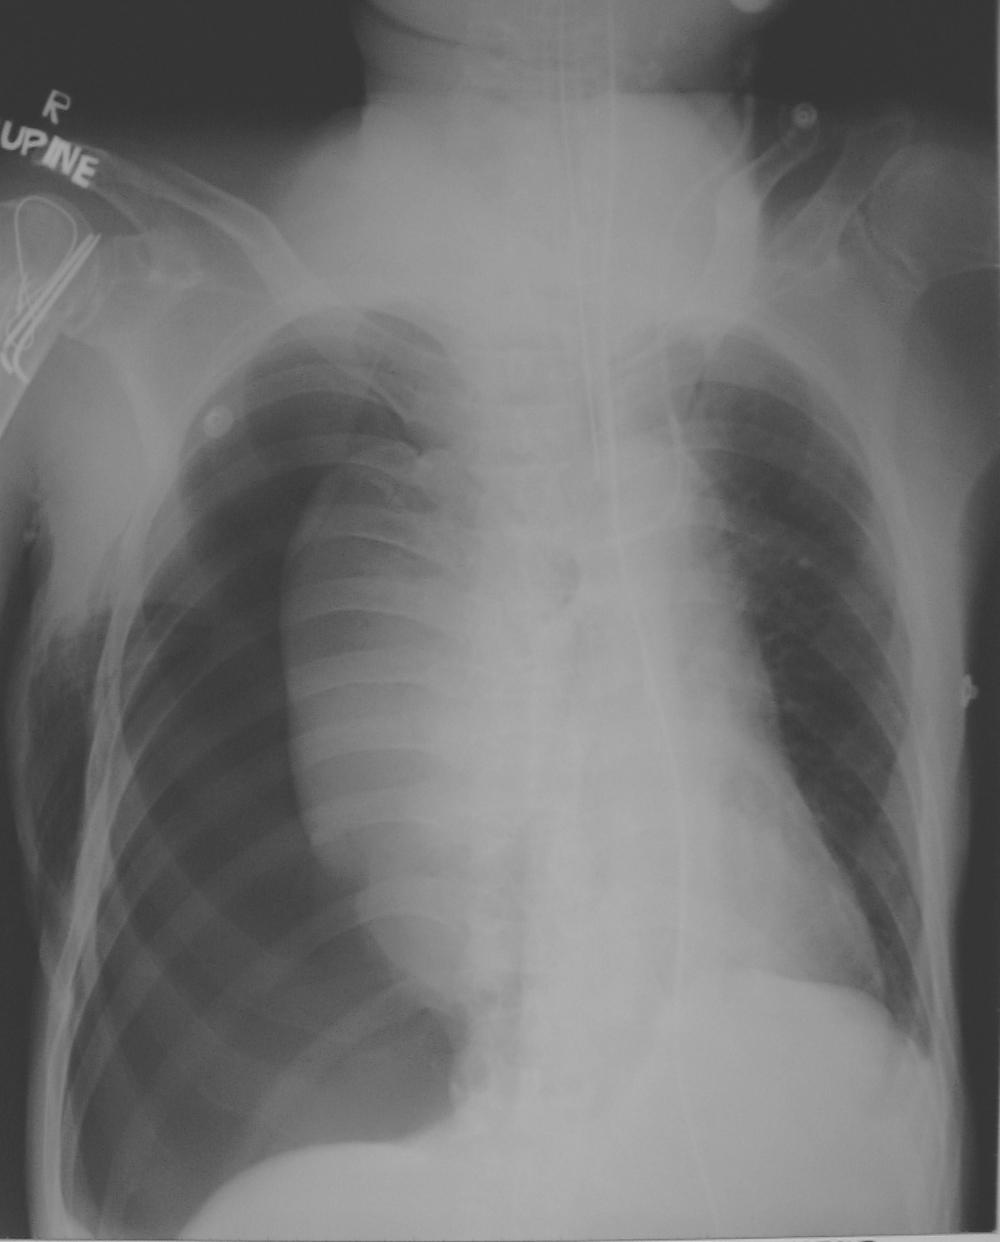 Pneumothorax (severe) 1